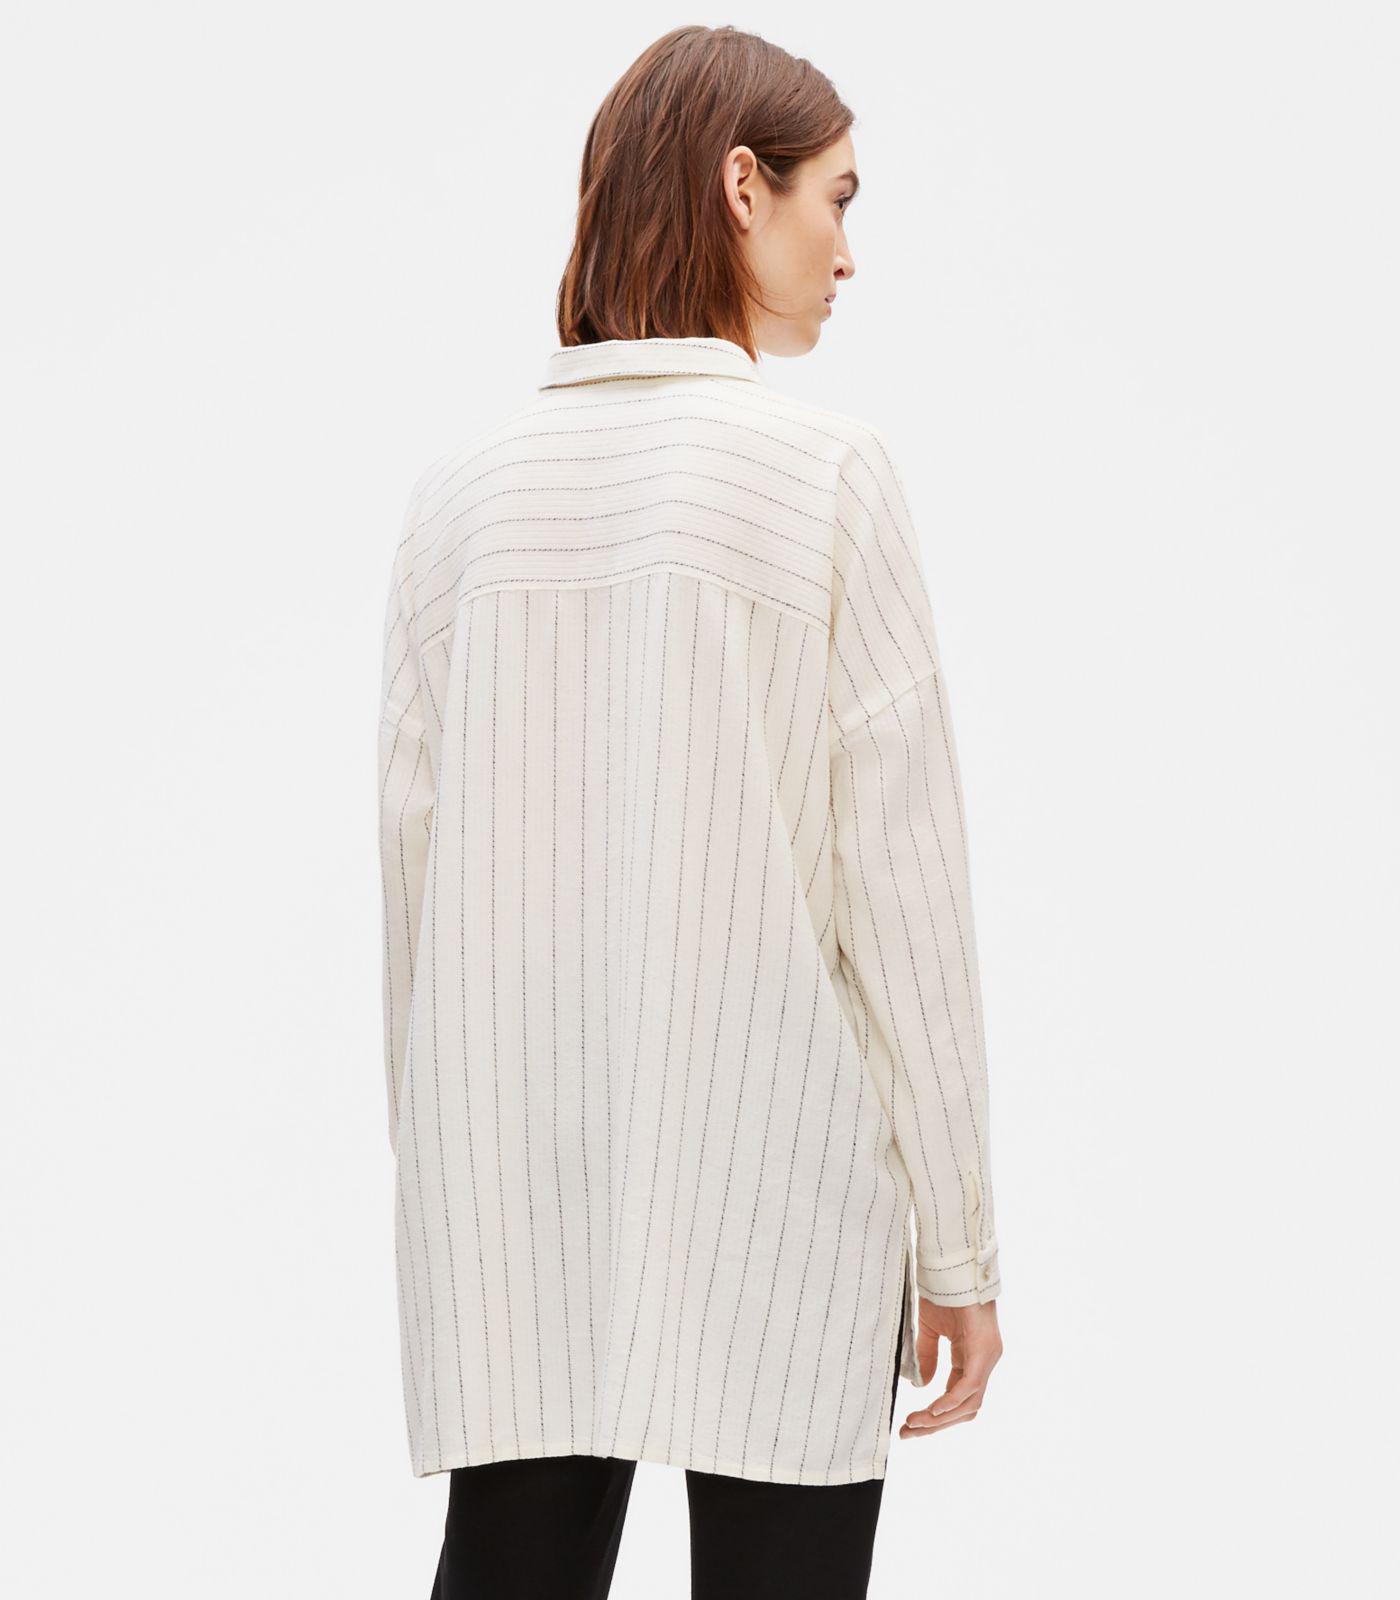 5a36ac990bc747 Lyst - Eileen Fisher Gauzy Organic Cotton Shirt in White